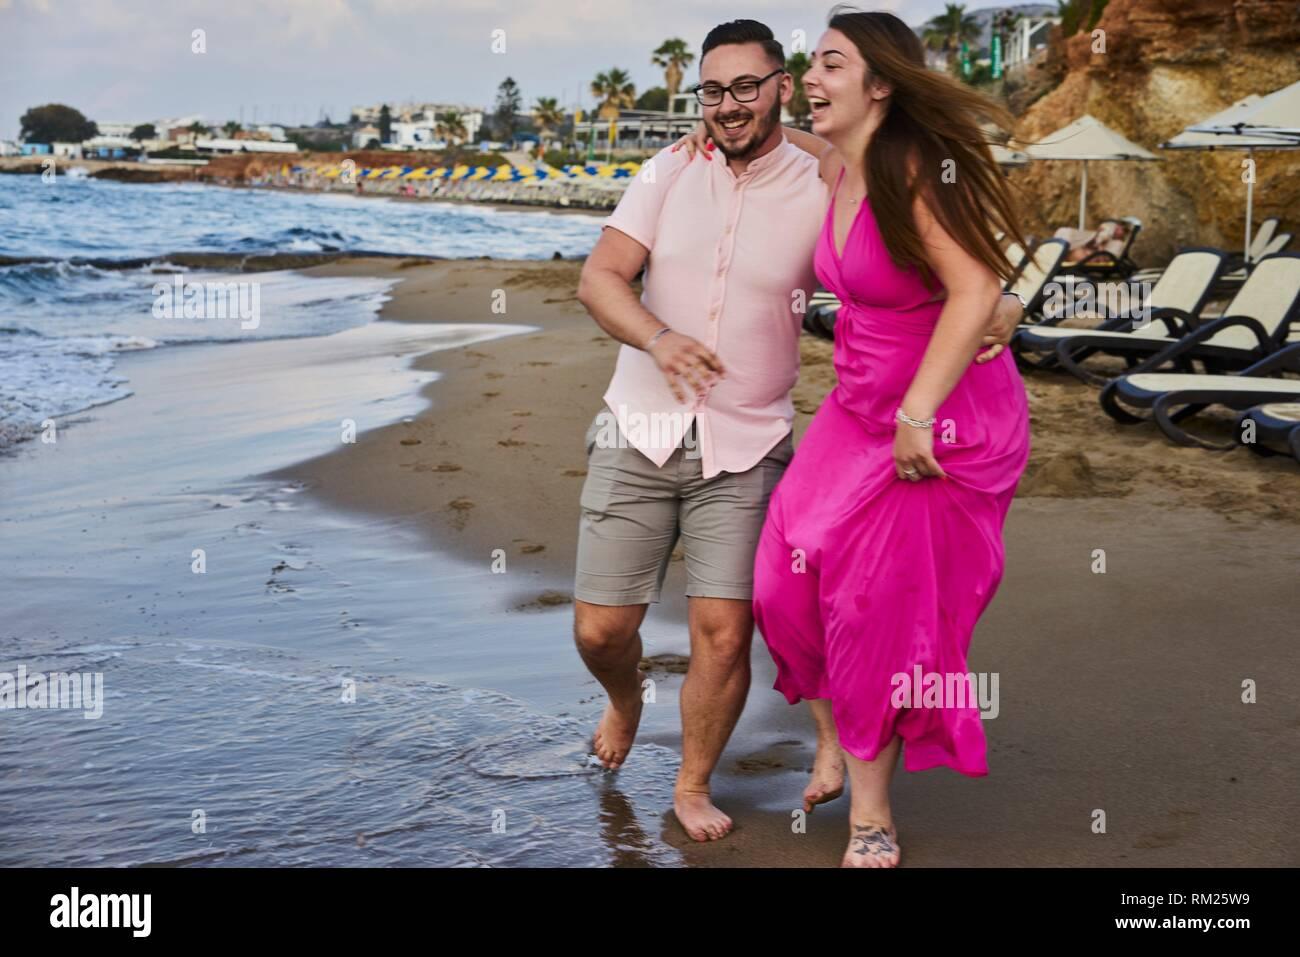 Chersonissos, Crete, Greece, couple running on beach, playful, teasing, joking, fun, holiday - Stock Image